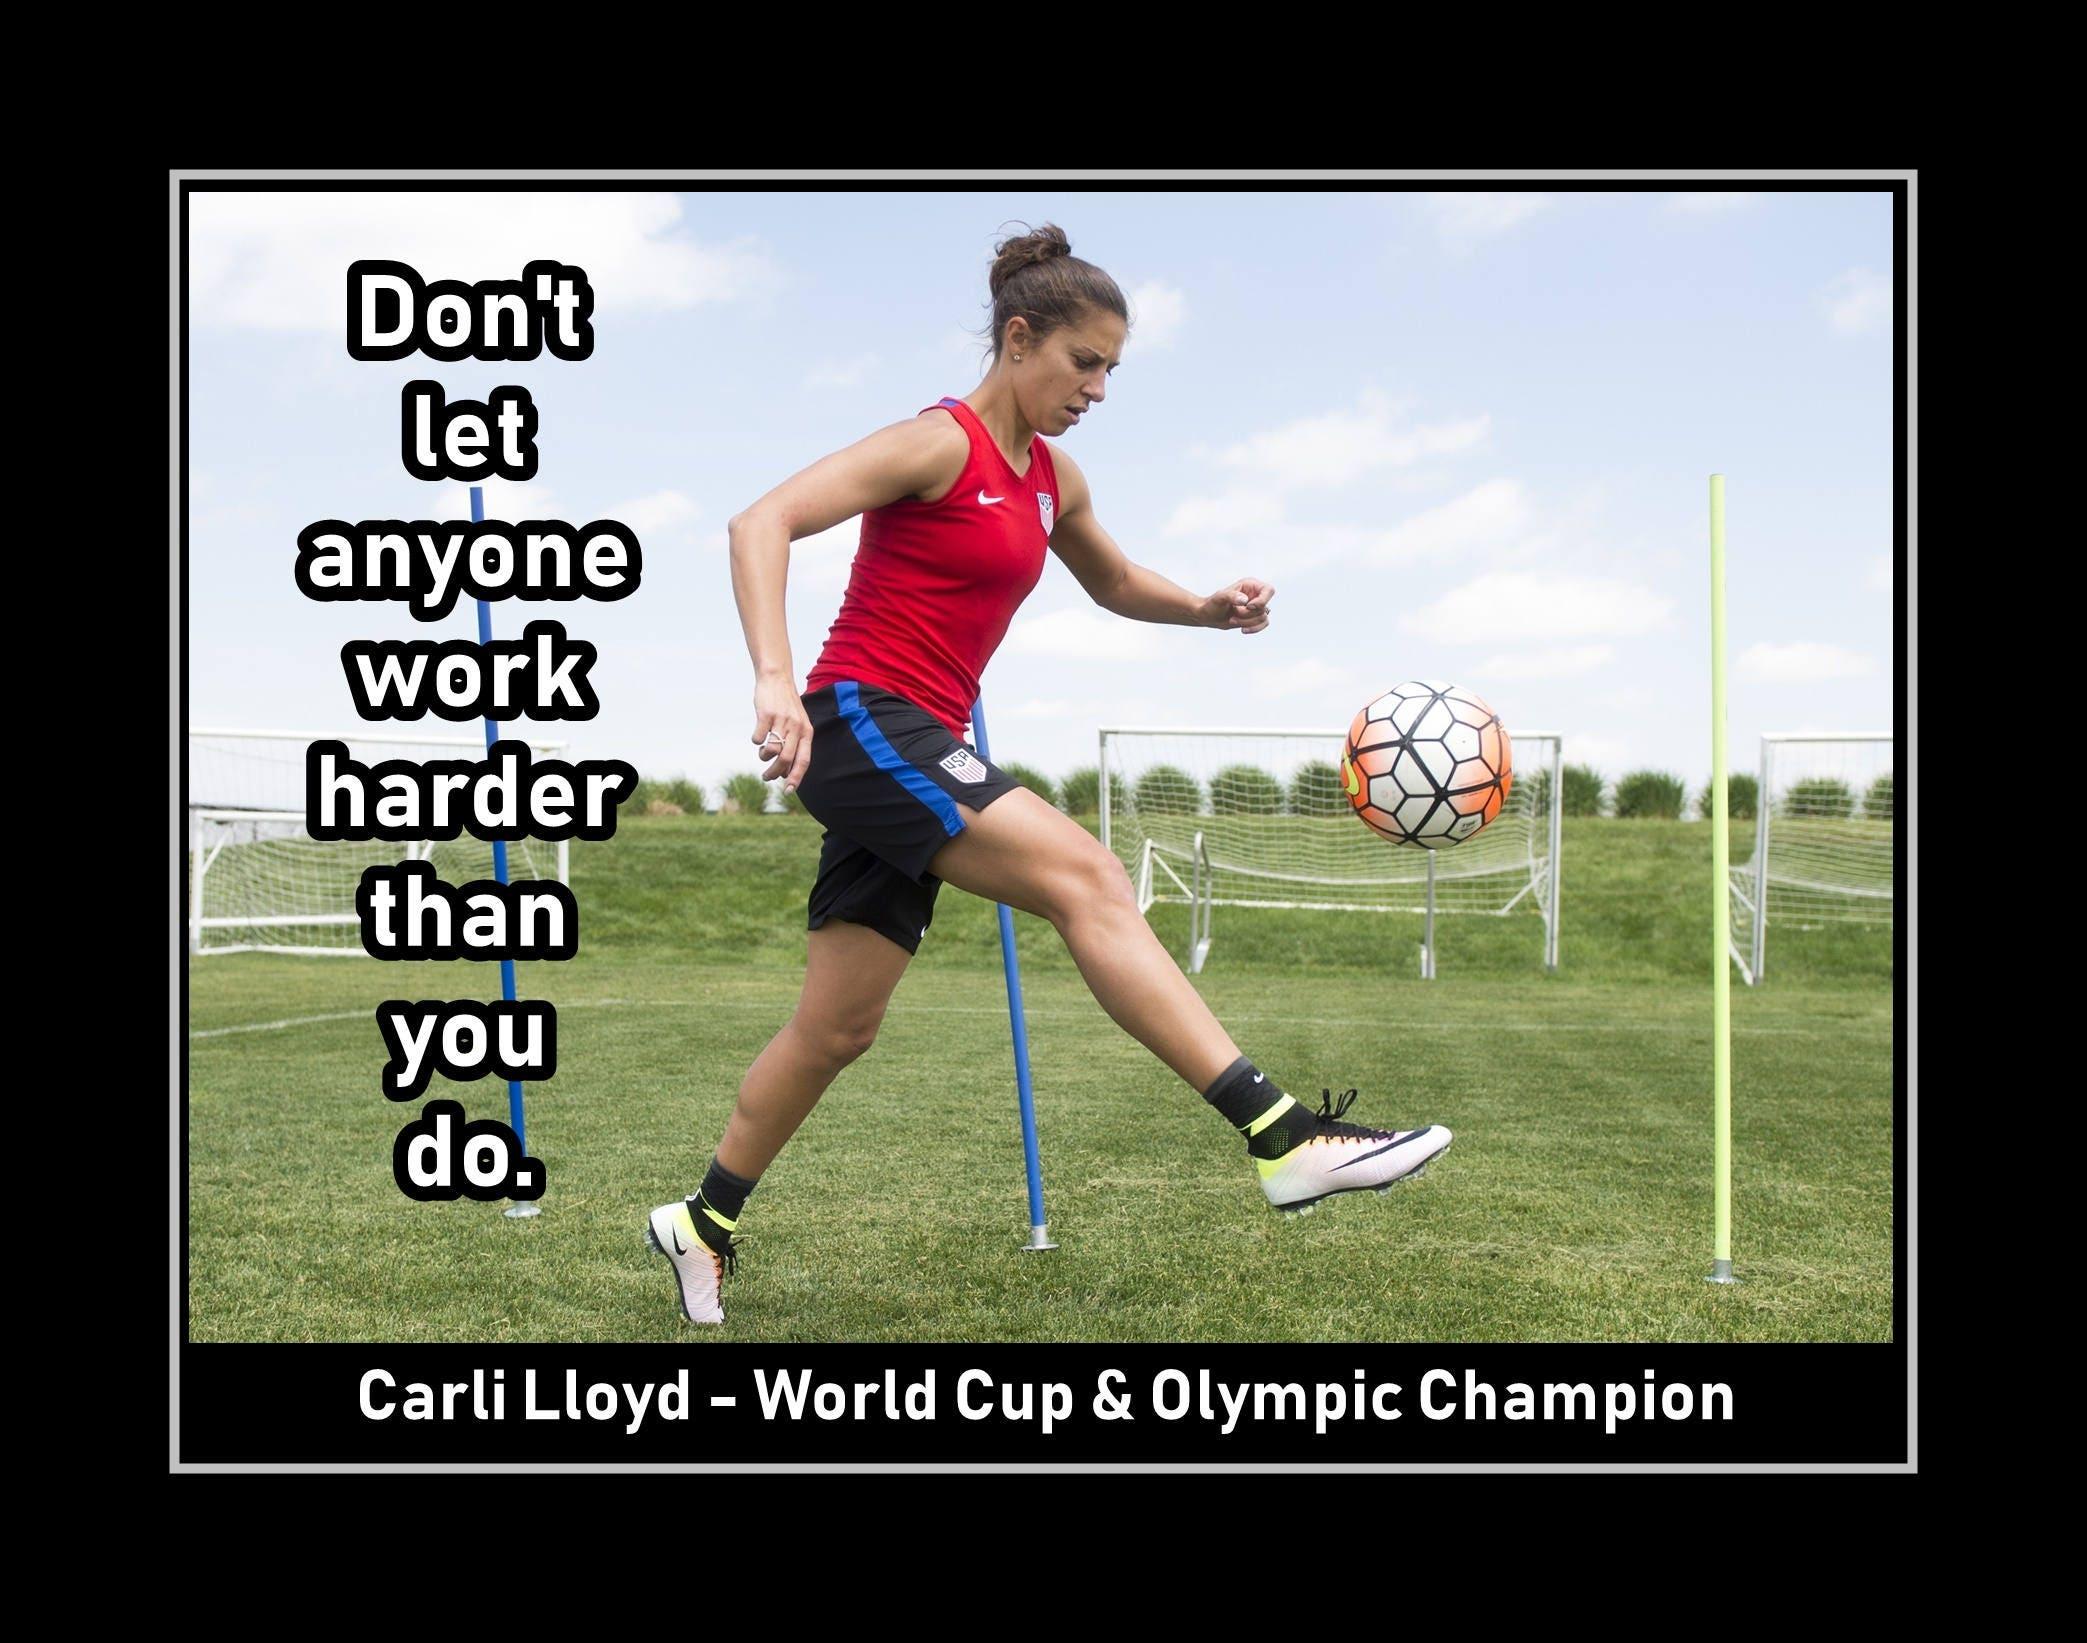 Carli Lloyd Quotes Carli Lloyd Girls Soccer Motivation Poster Hard Work Quote